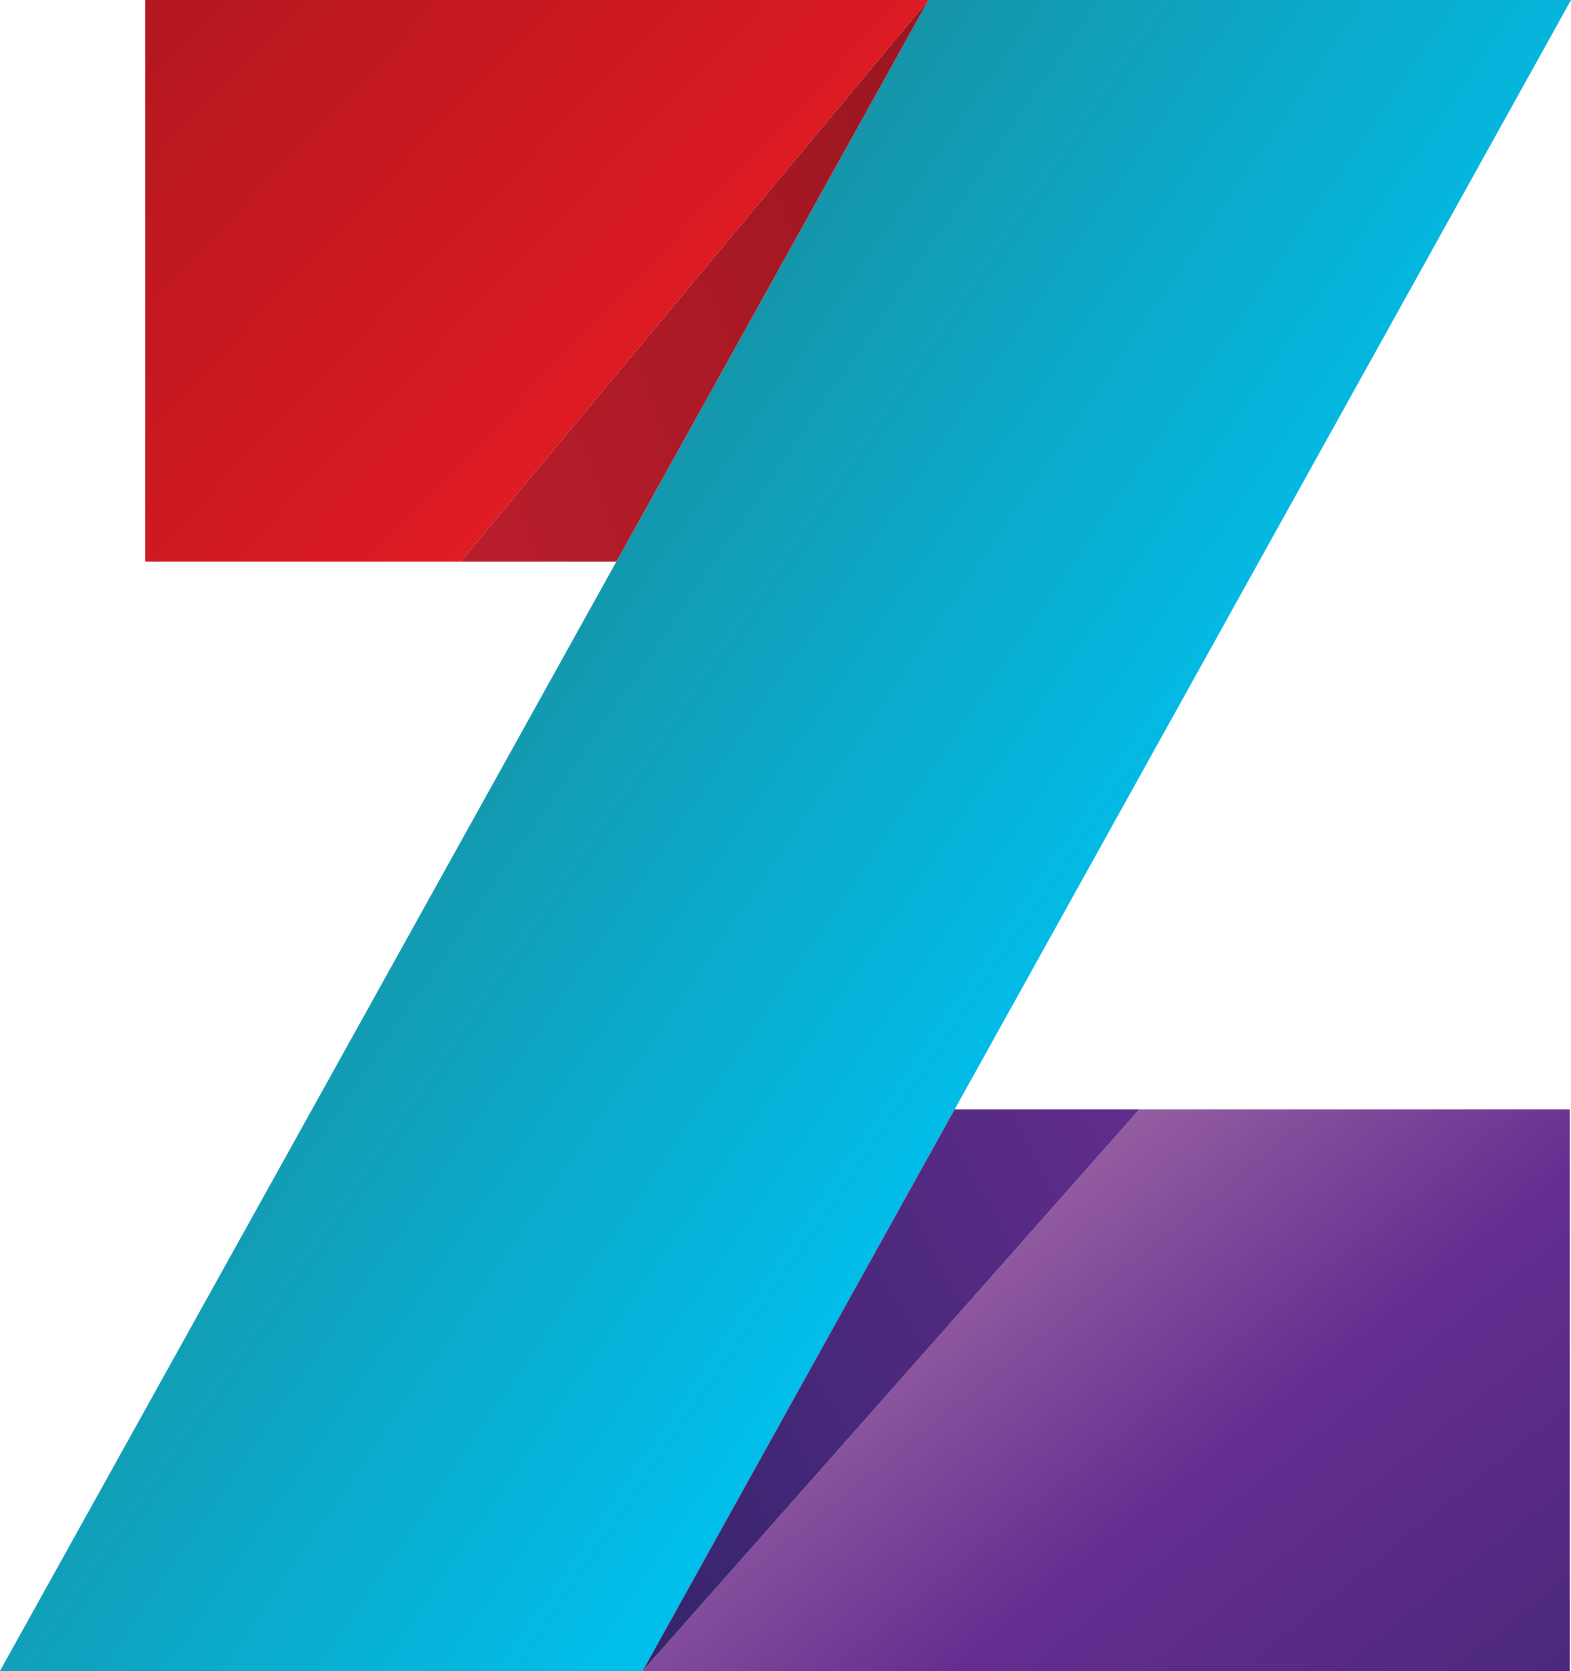 ZASH Global Media and Entertainment Corporation